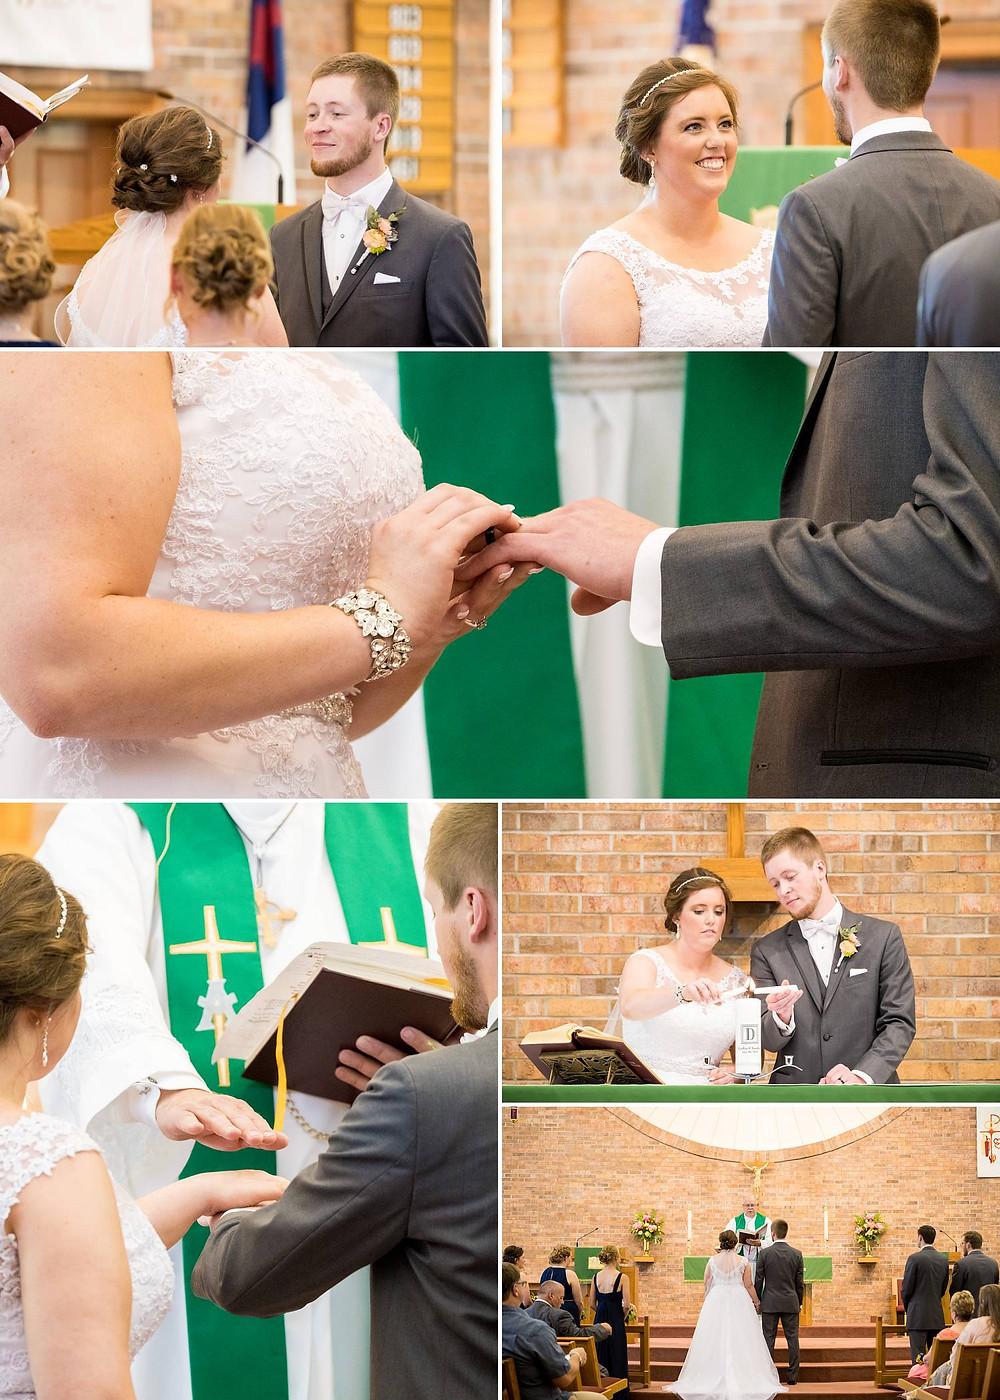 Oshkosh Wisconsin June Wedding Ceremony | Lanari Photography